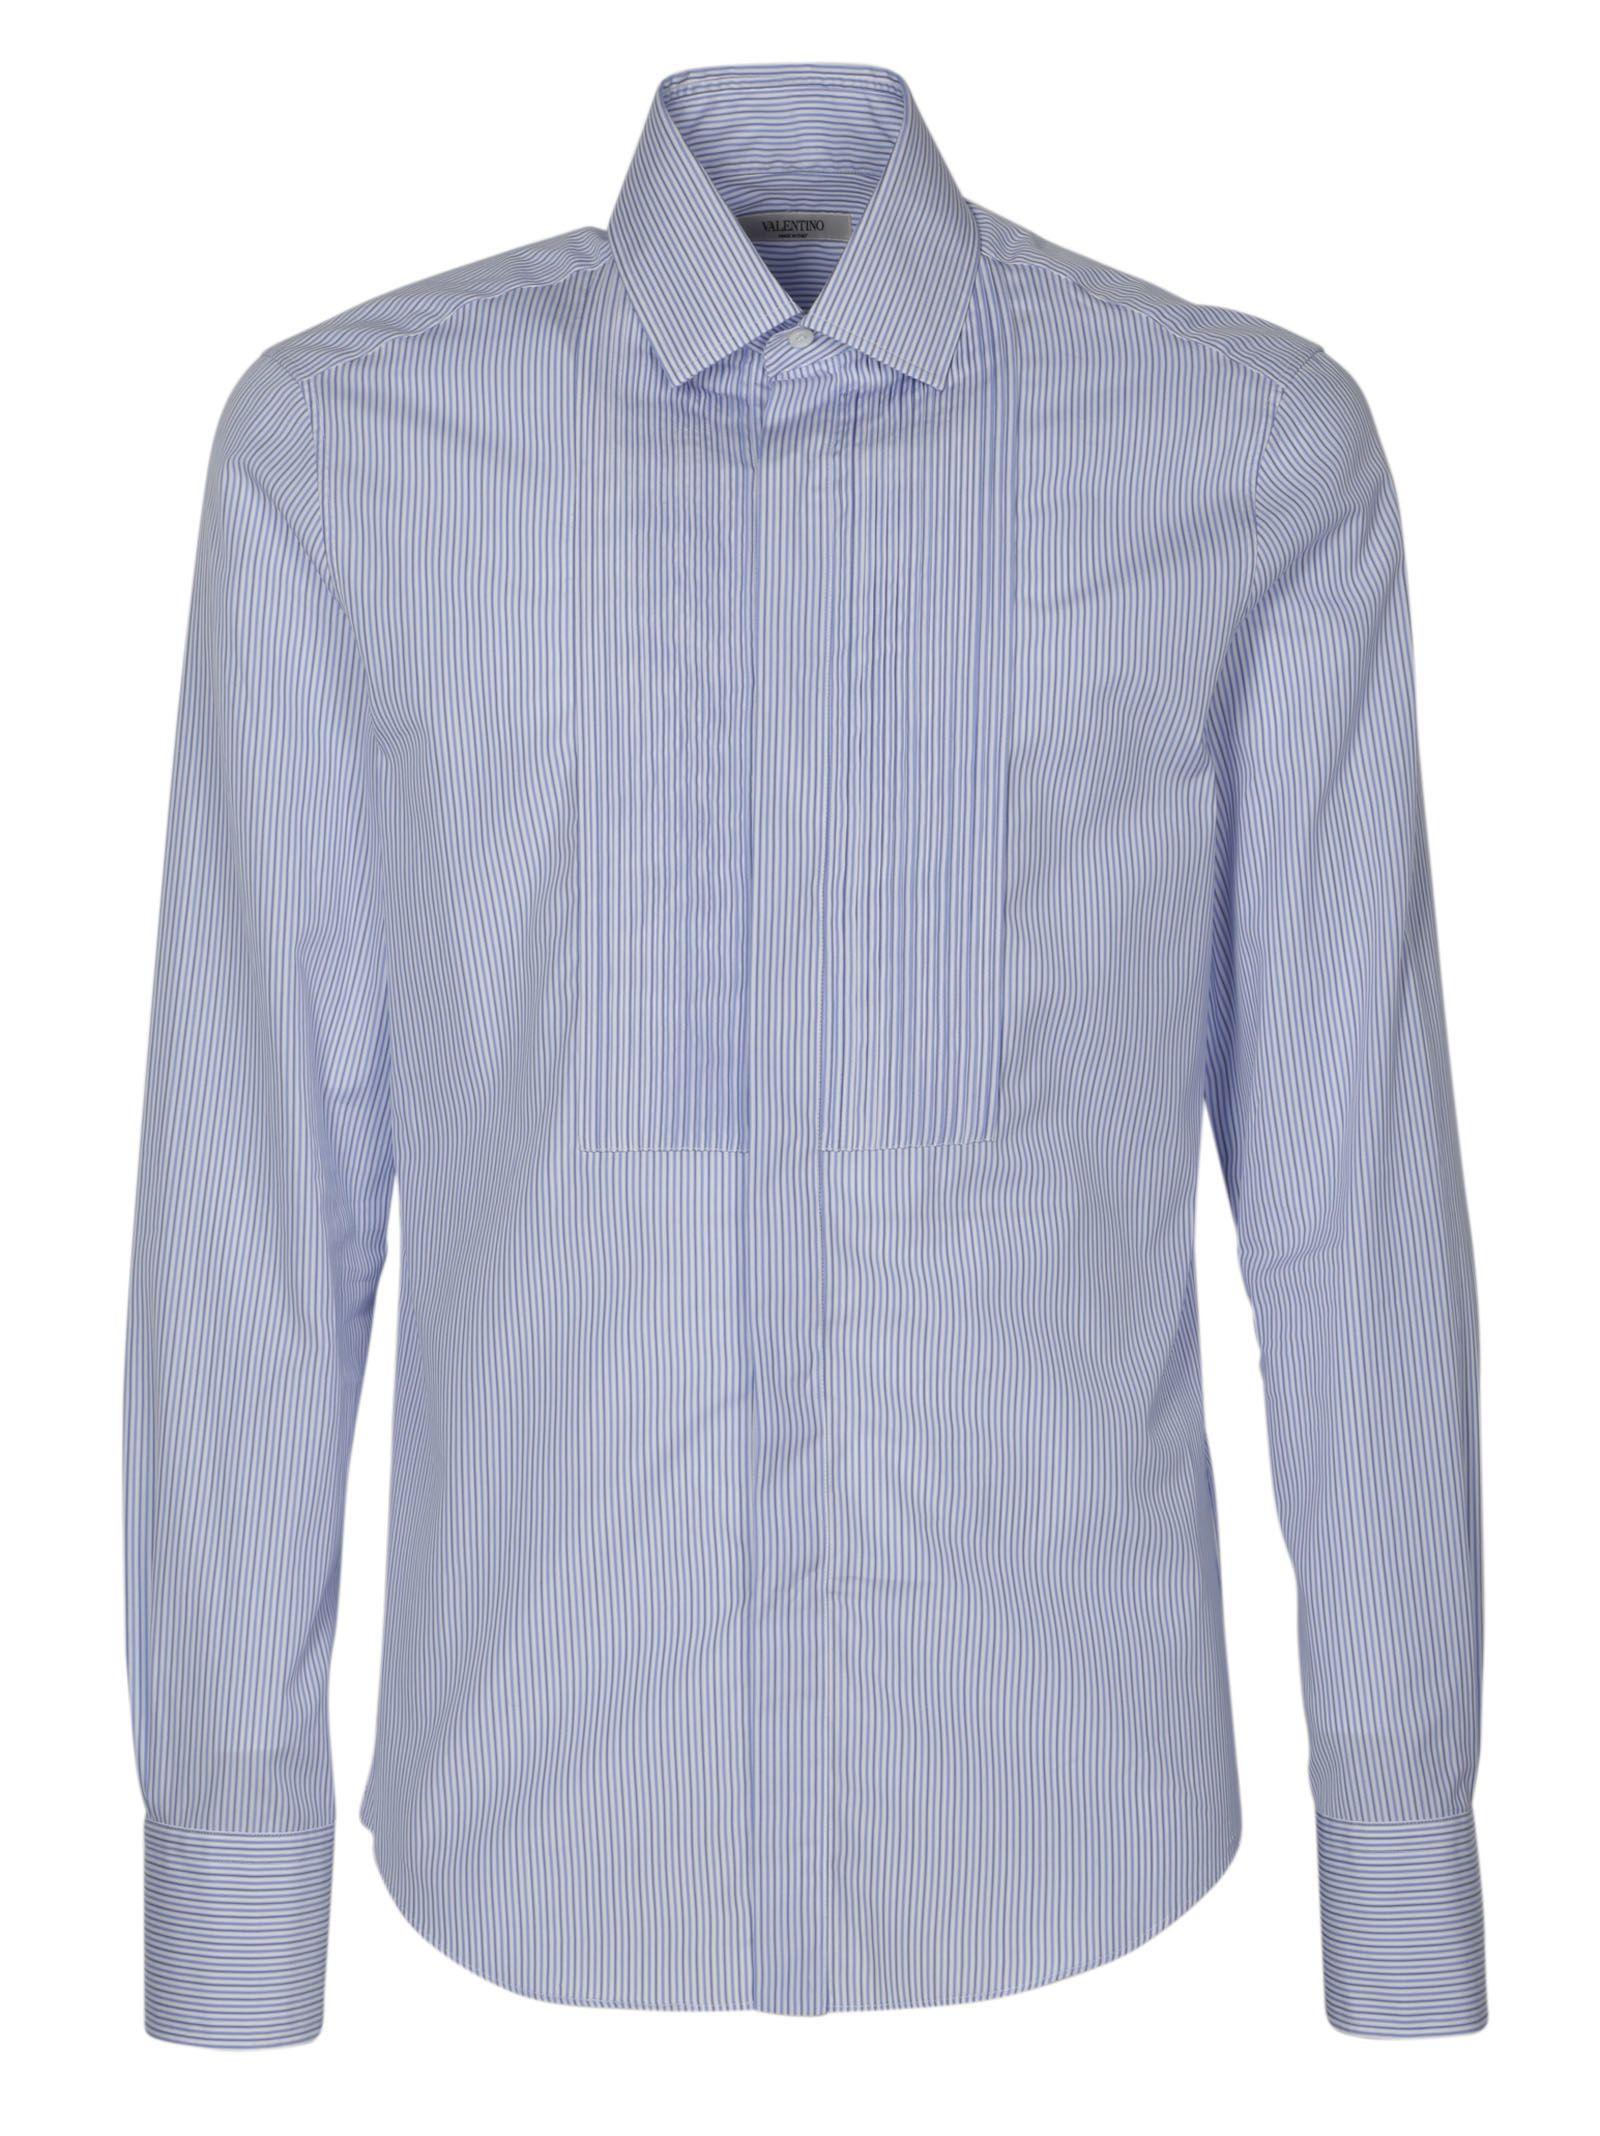 Valentino Prêt-à-porter Shirt